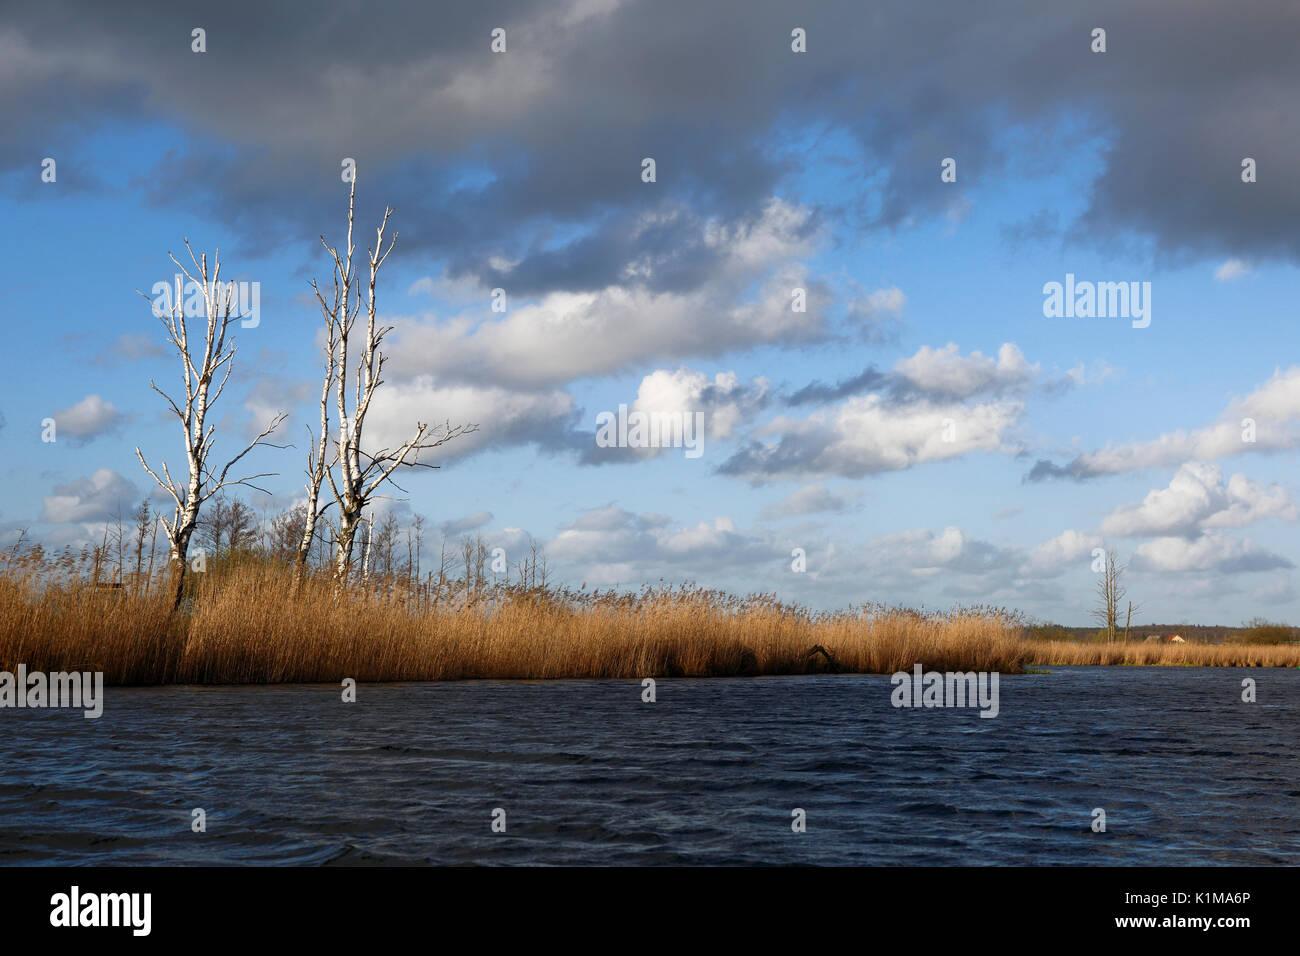 Landscape in the Peene Valley, Naturpark Flusslandschaft Peenetal, Mecklenburg-Western Pomerania, Germany - Stock Image